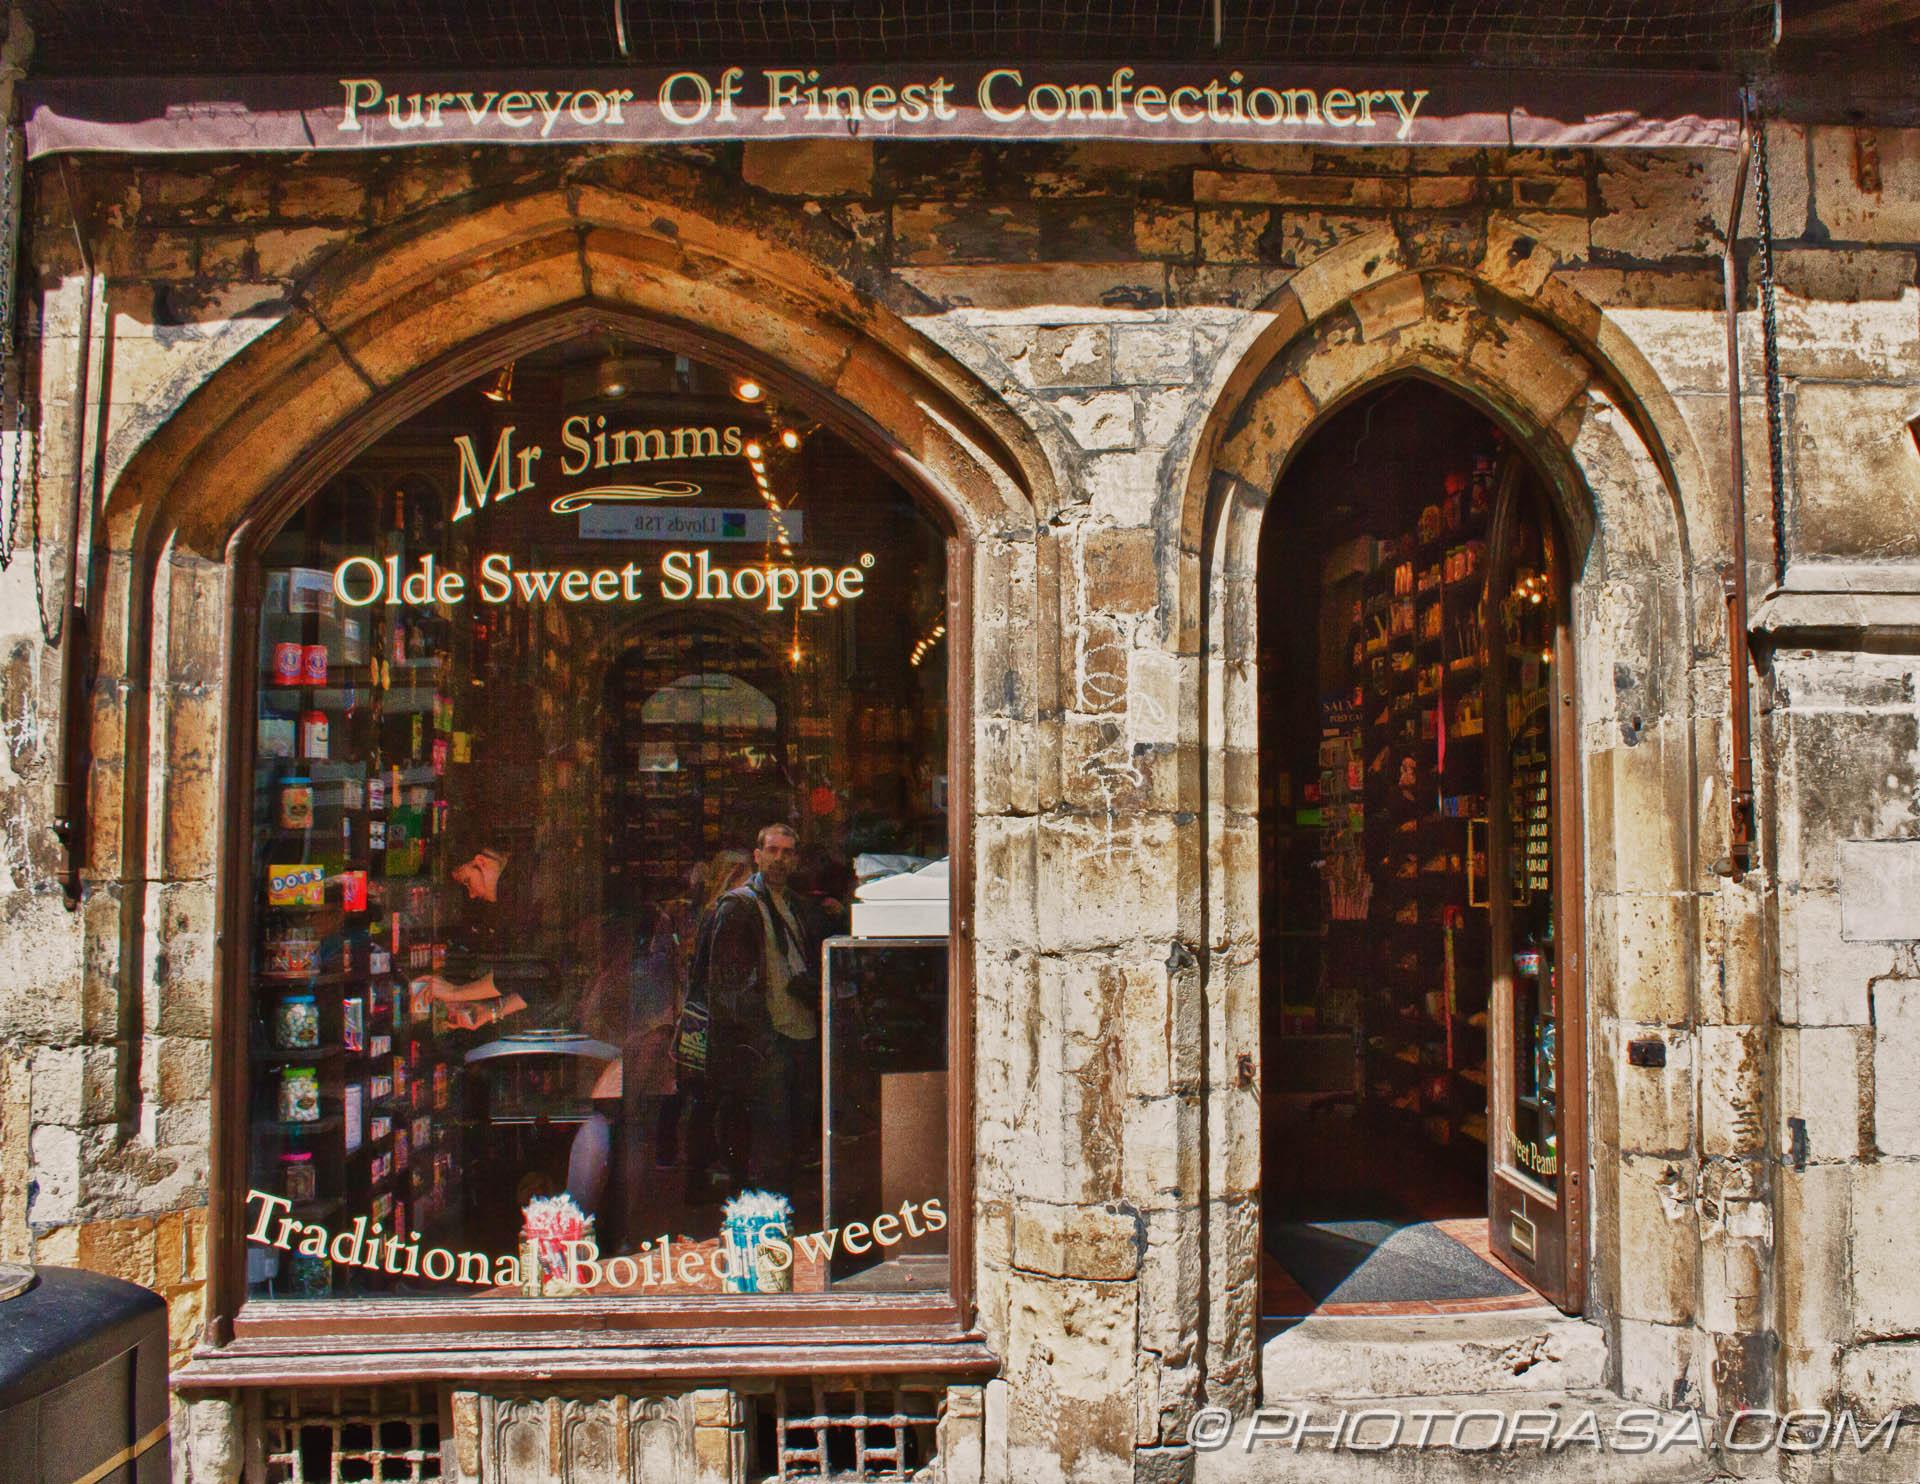 http://photorasa.com/canterbury-trip/mr-simms-olde-sweet-shoppe/